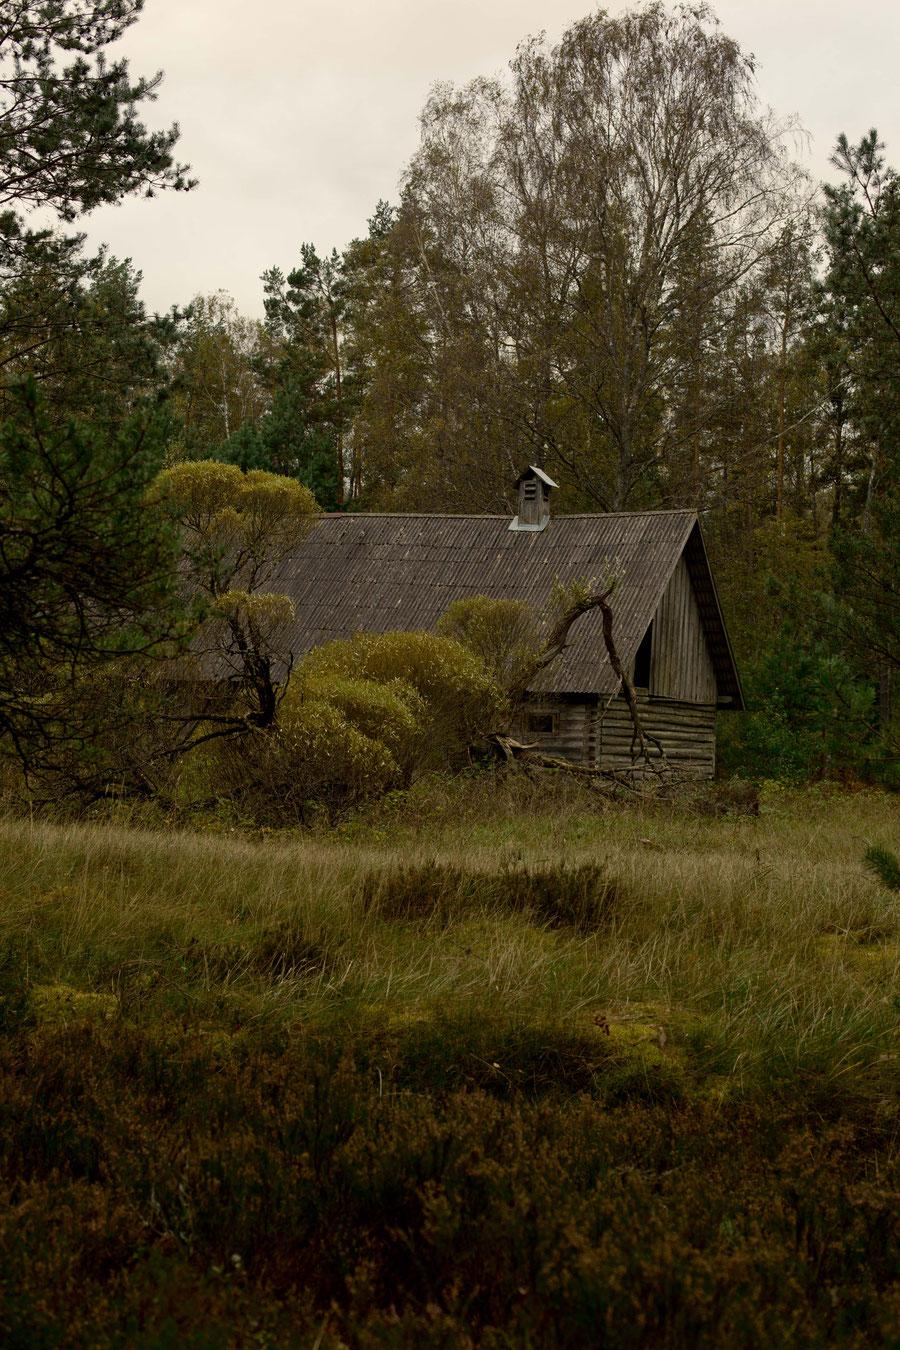 Holzhaus am Straßenrand